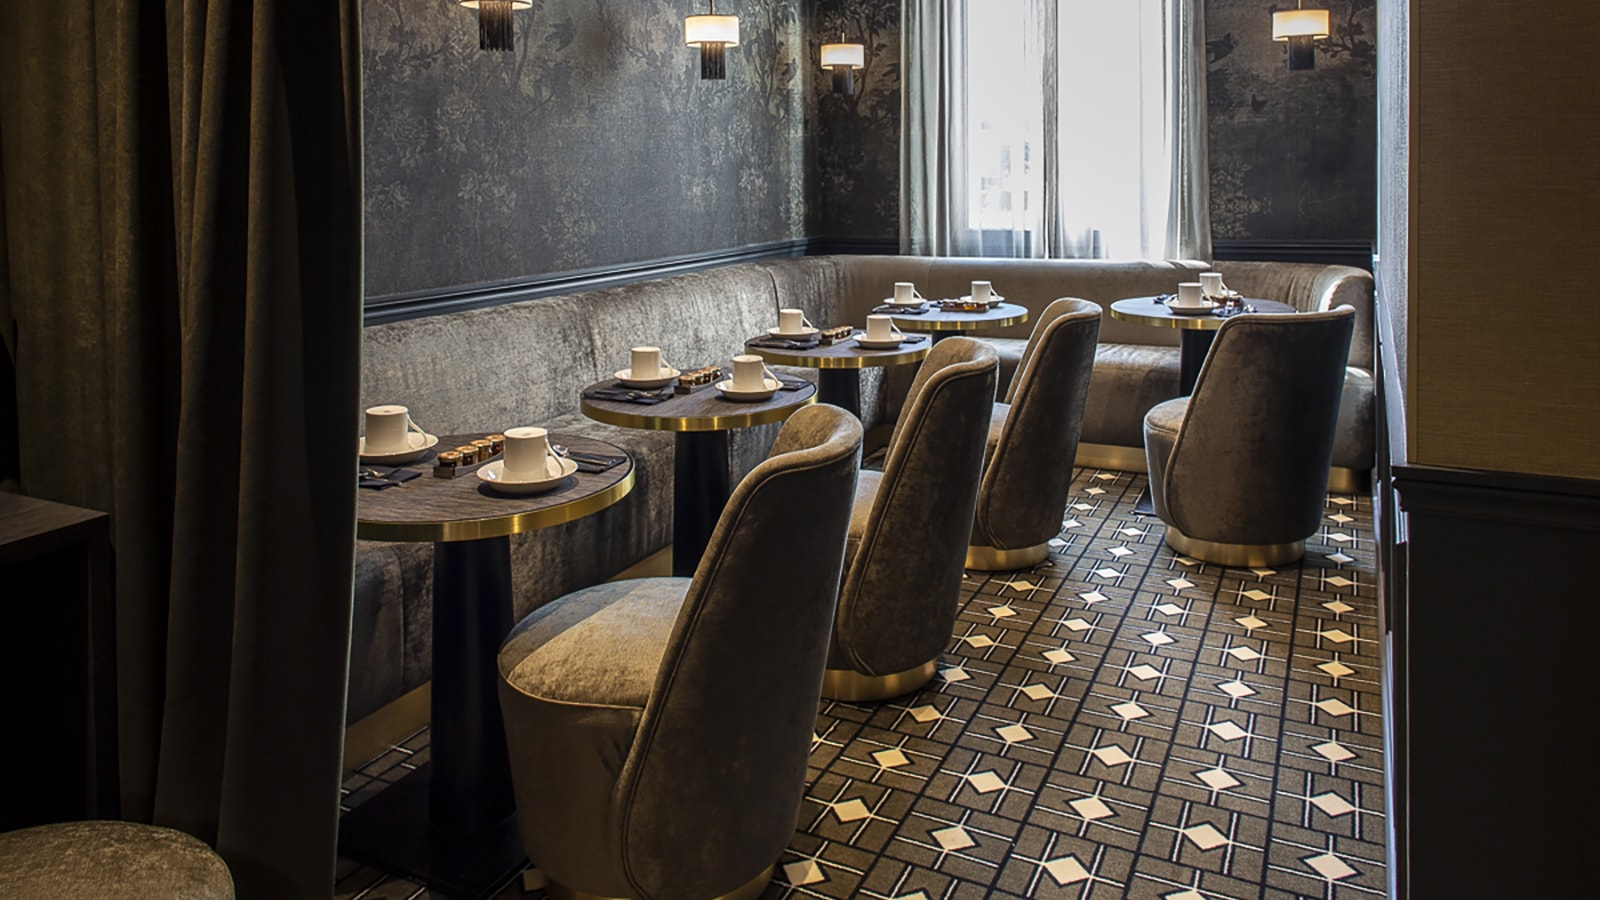 EFI Design Hotel Lenox Paris Efi Design (7) 1161